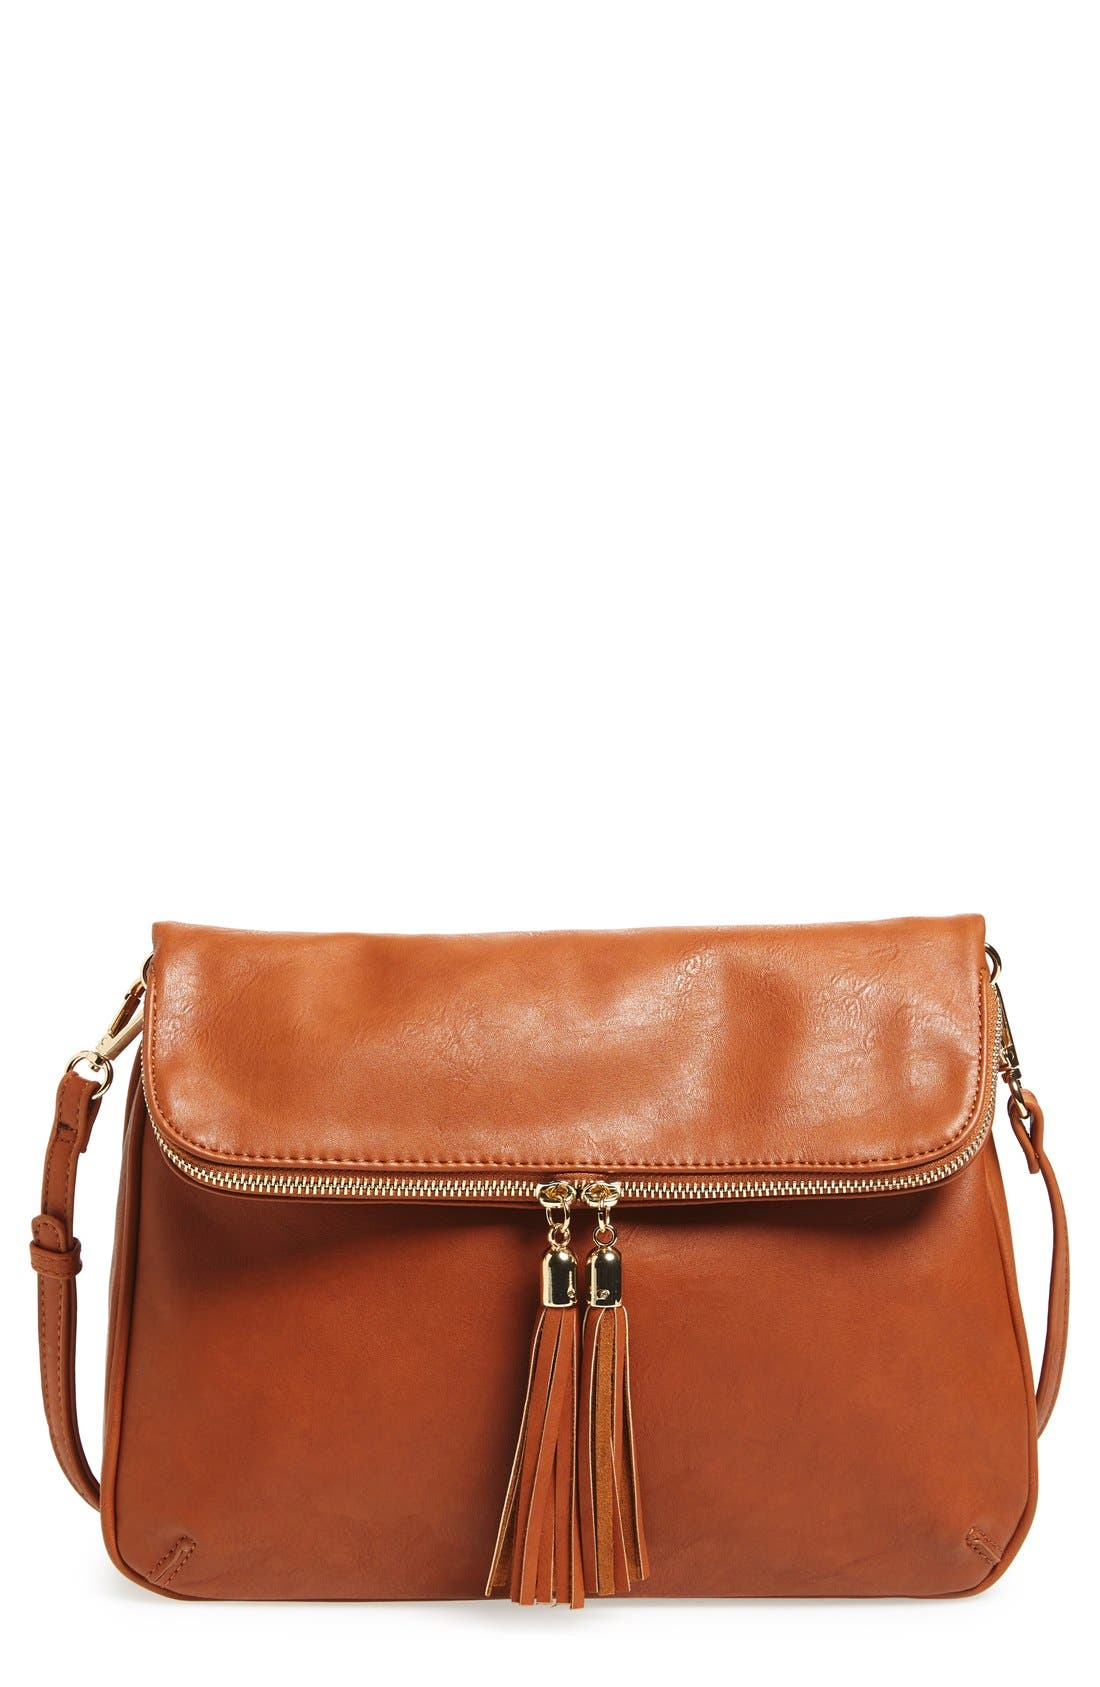 Main Image - BP. Foldover Crossbody Bag